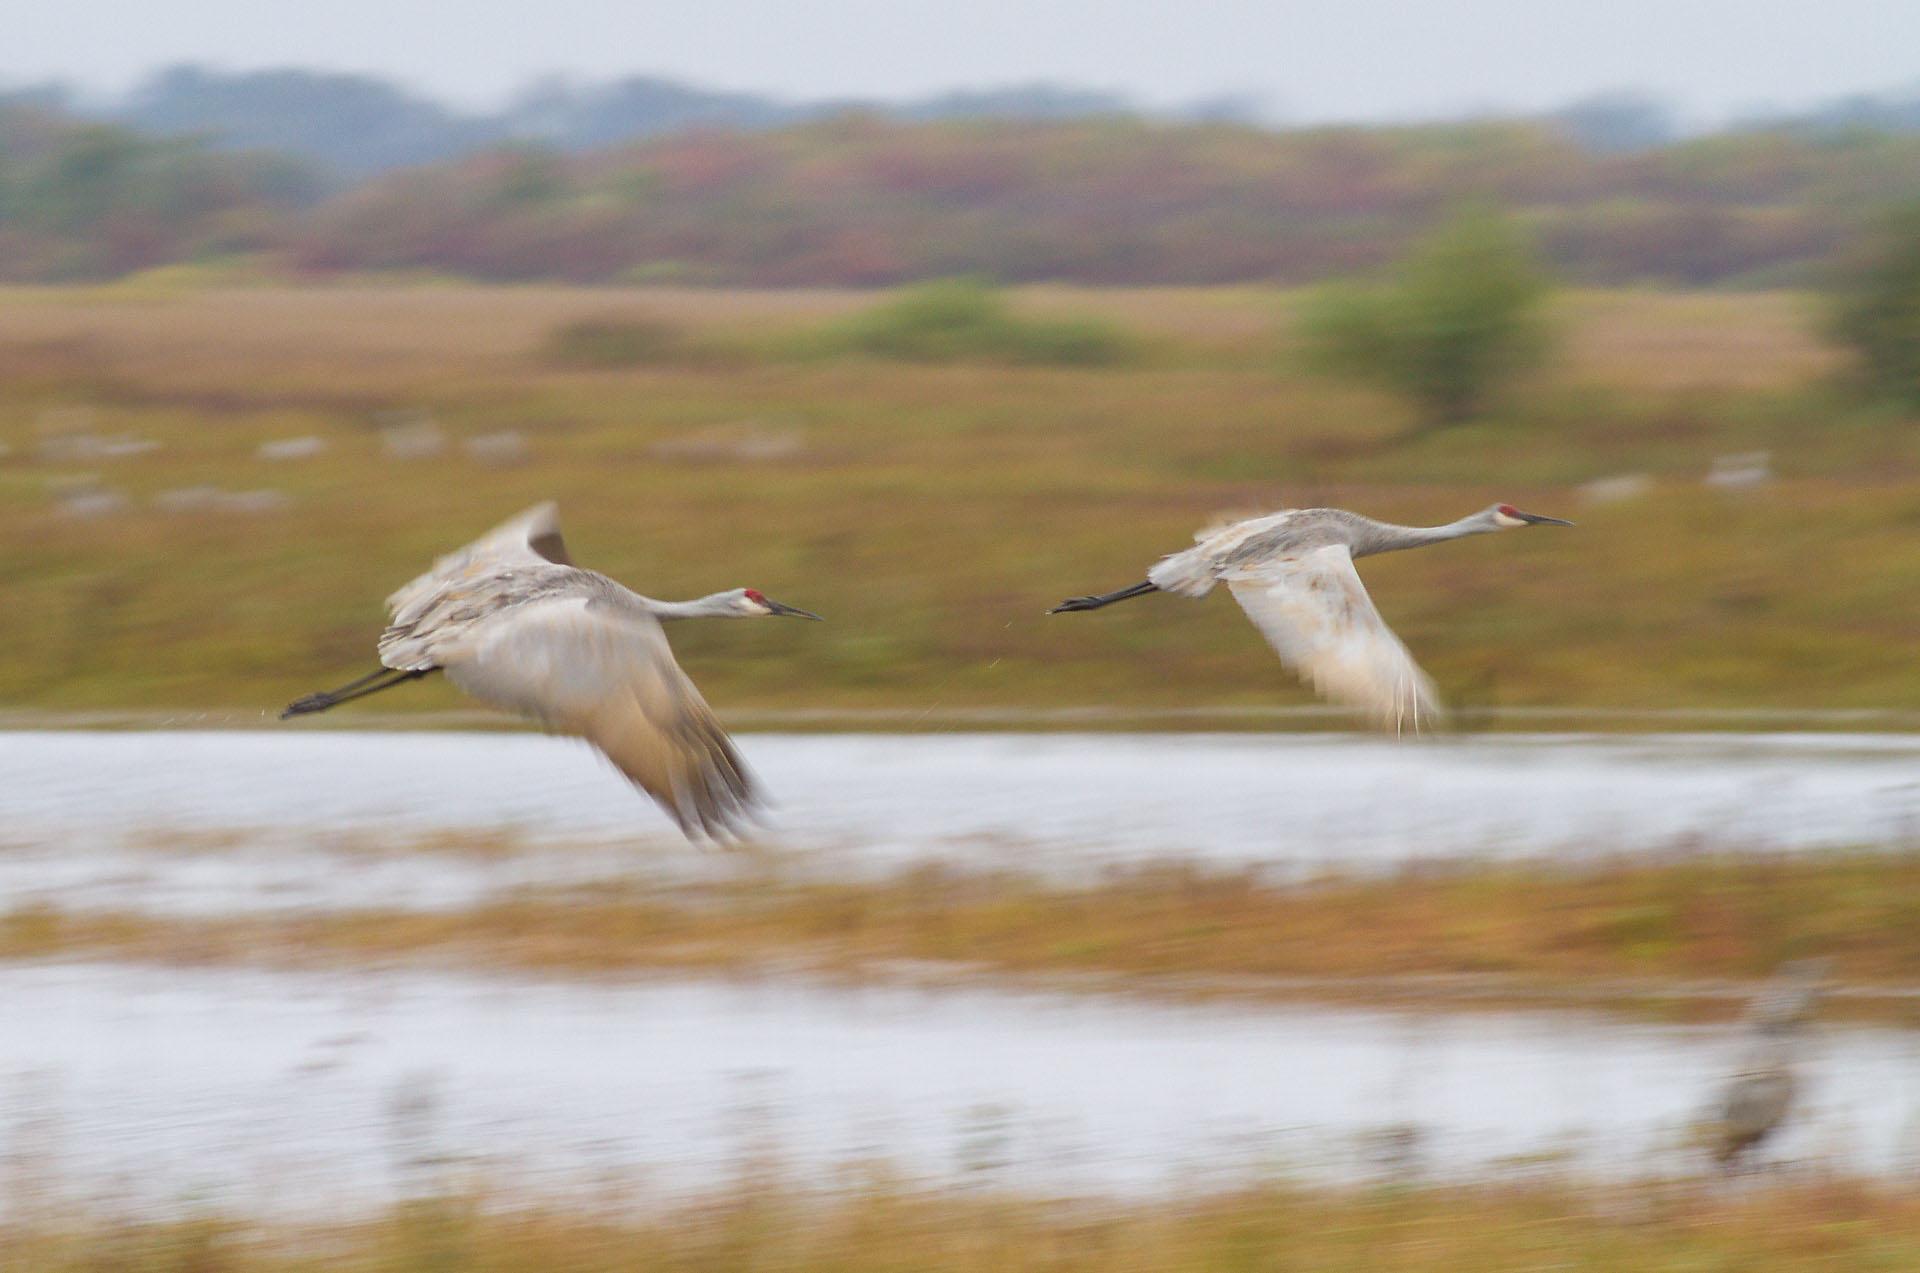 Sandhill Crane motion blur panning flight Crex Meadows Grantsburg WI IMG_0252